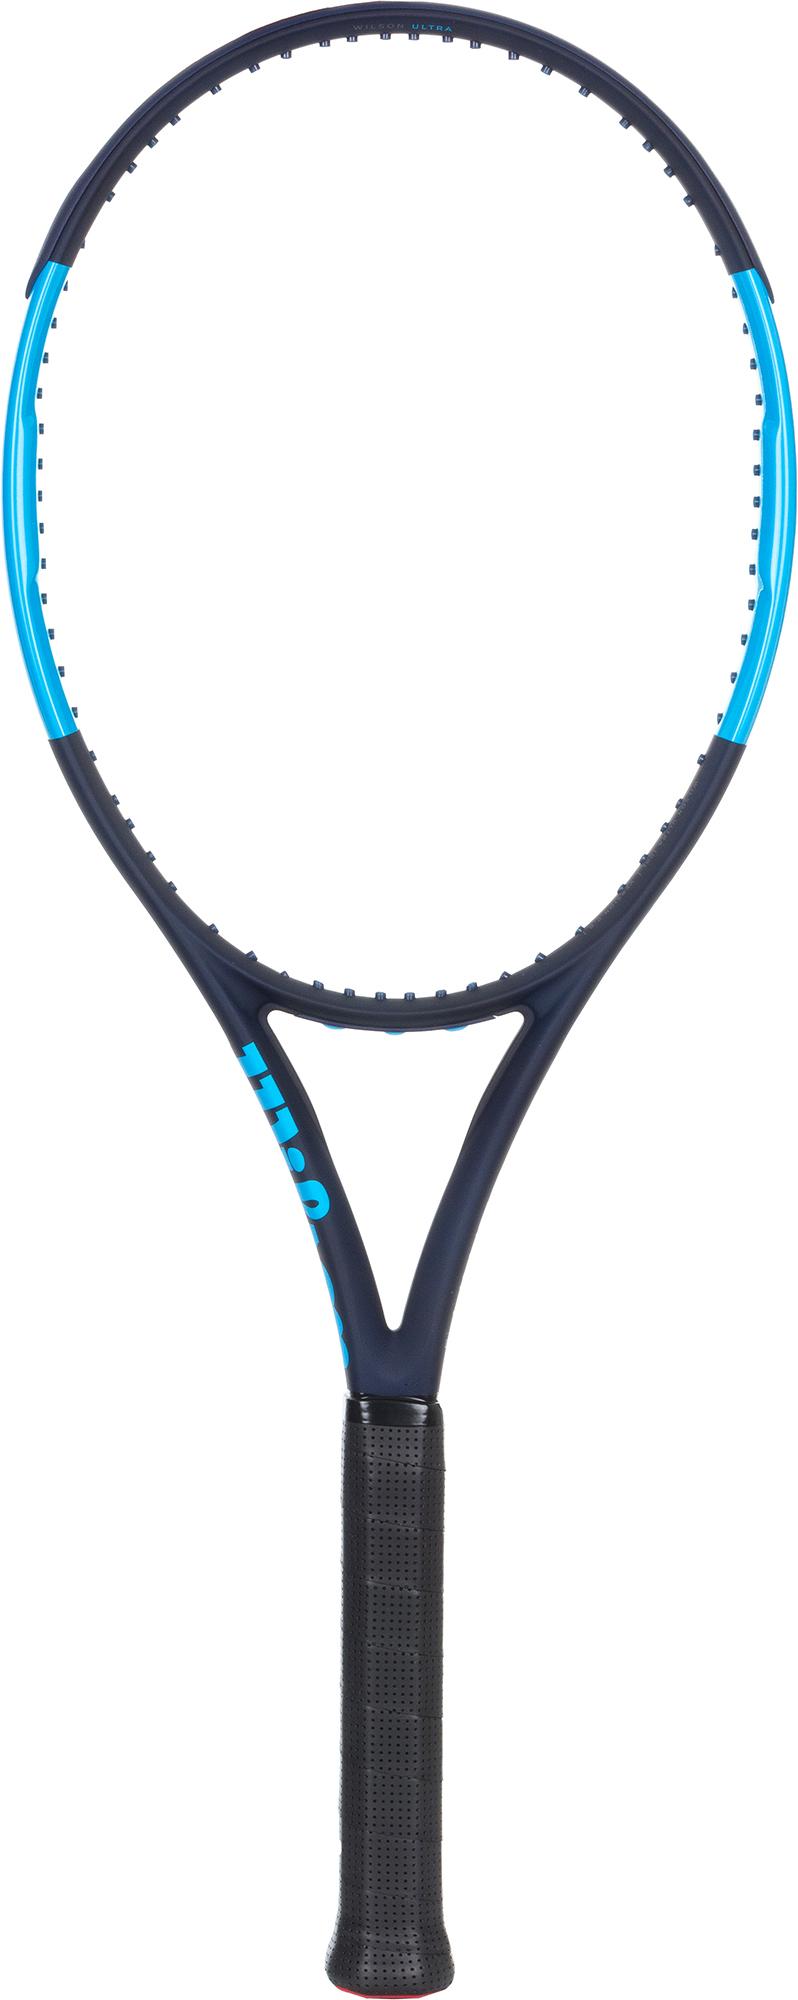 Wilson Ракетка для большого тенниса Wilson Ultra 100L, размер 3 wilson ракетка для большого тенниса детская wilson roger federer 23 размер без размера